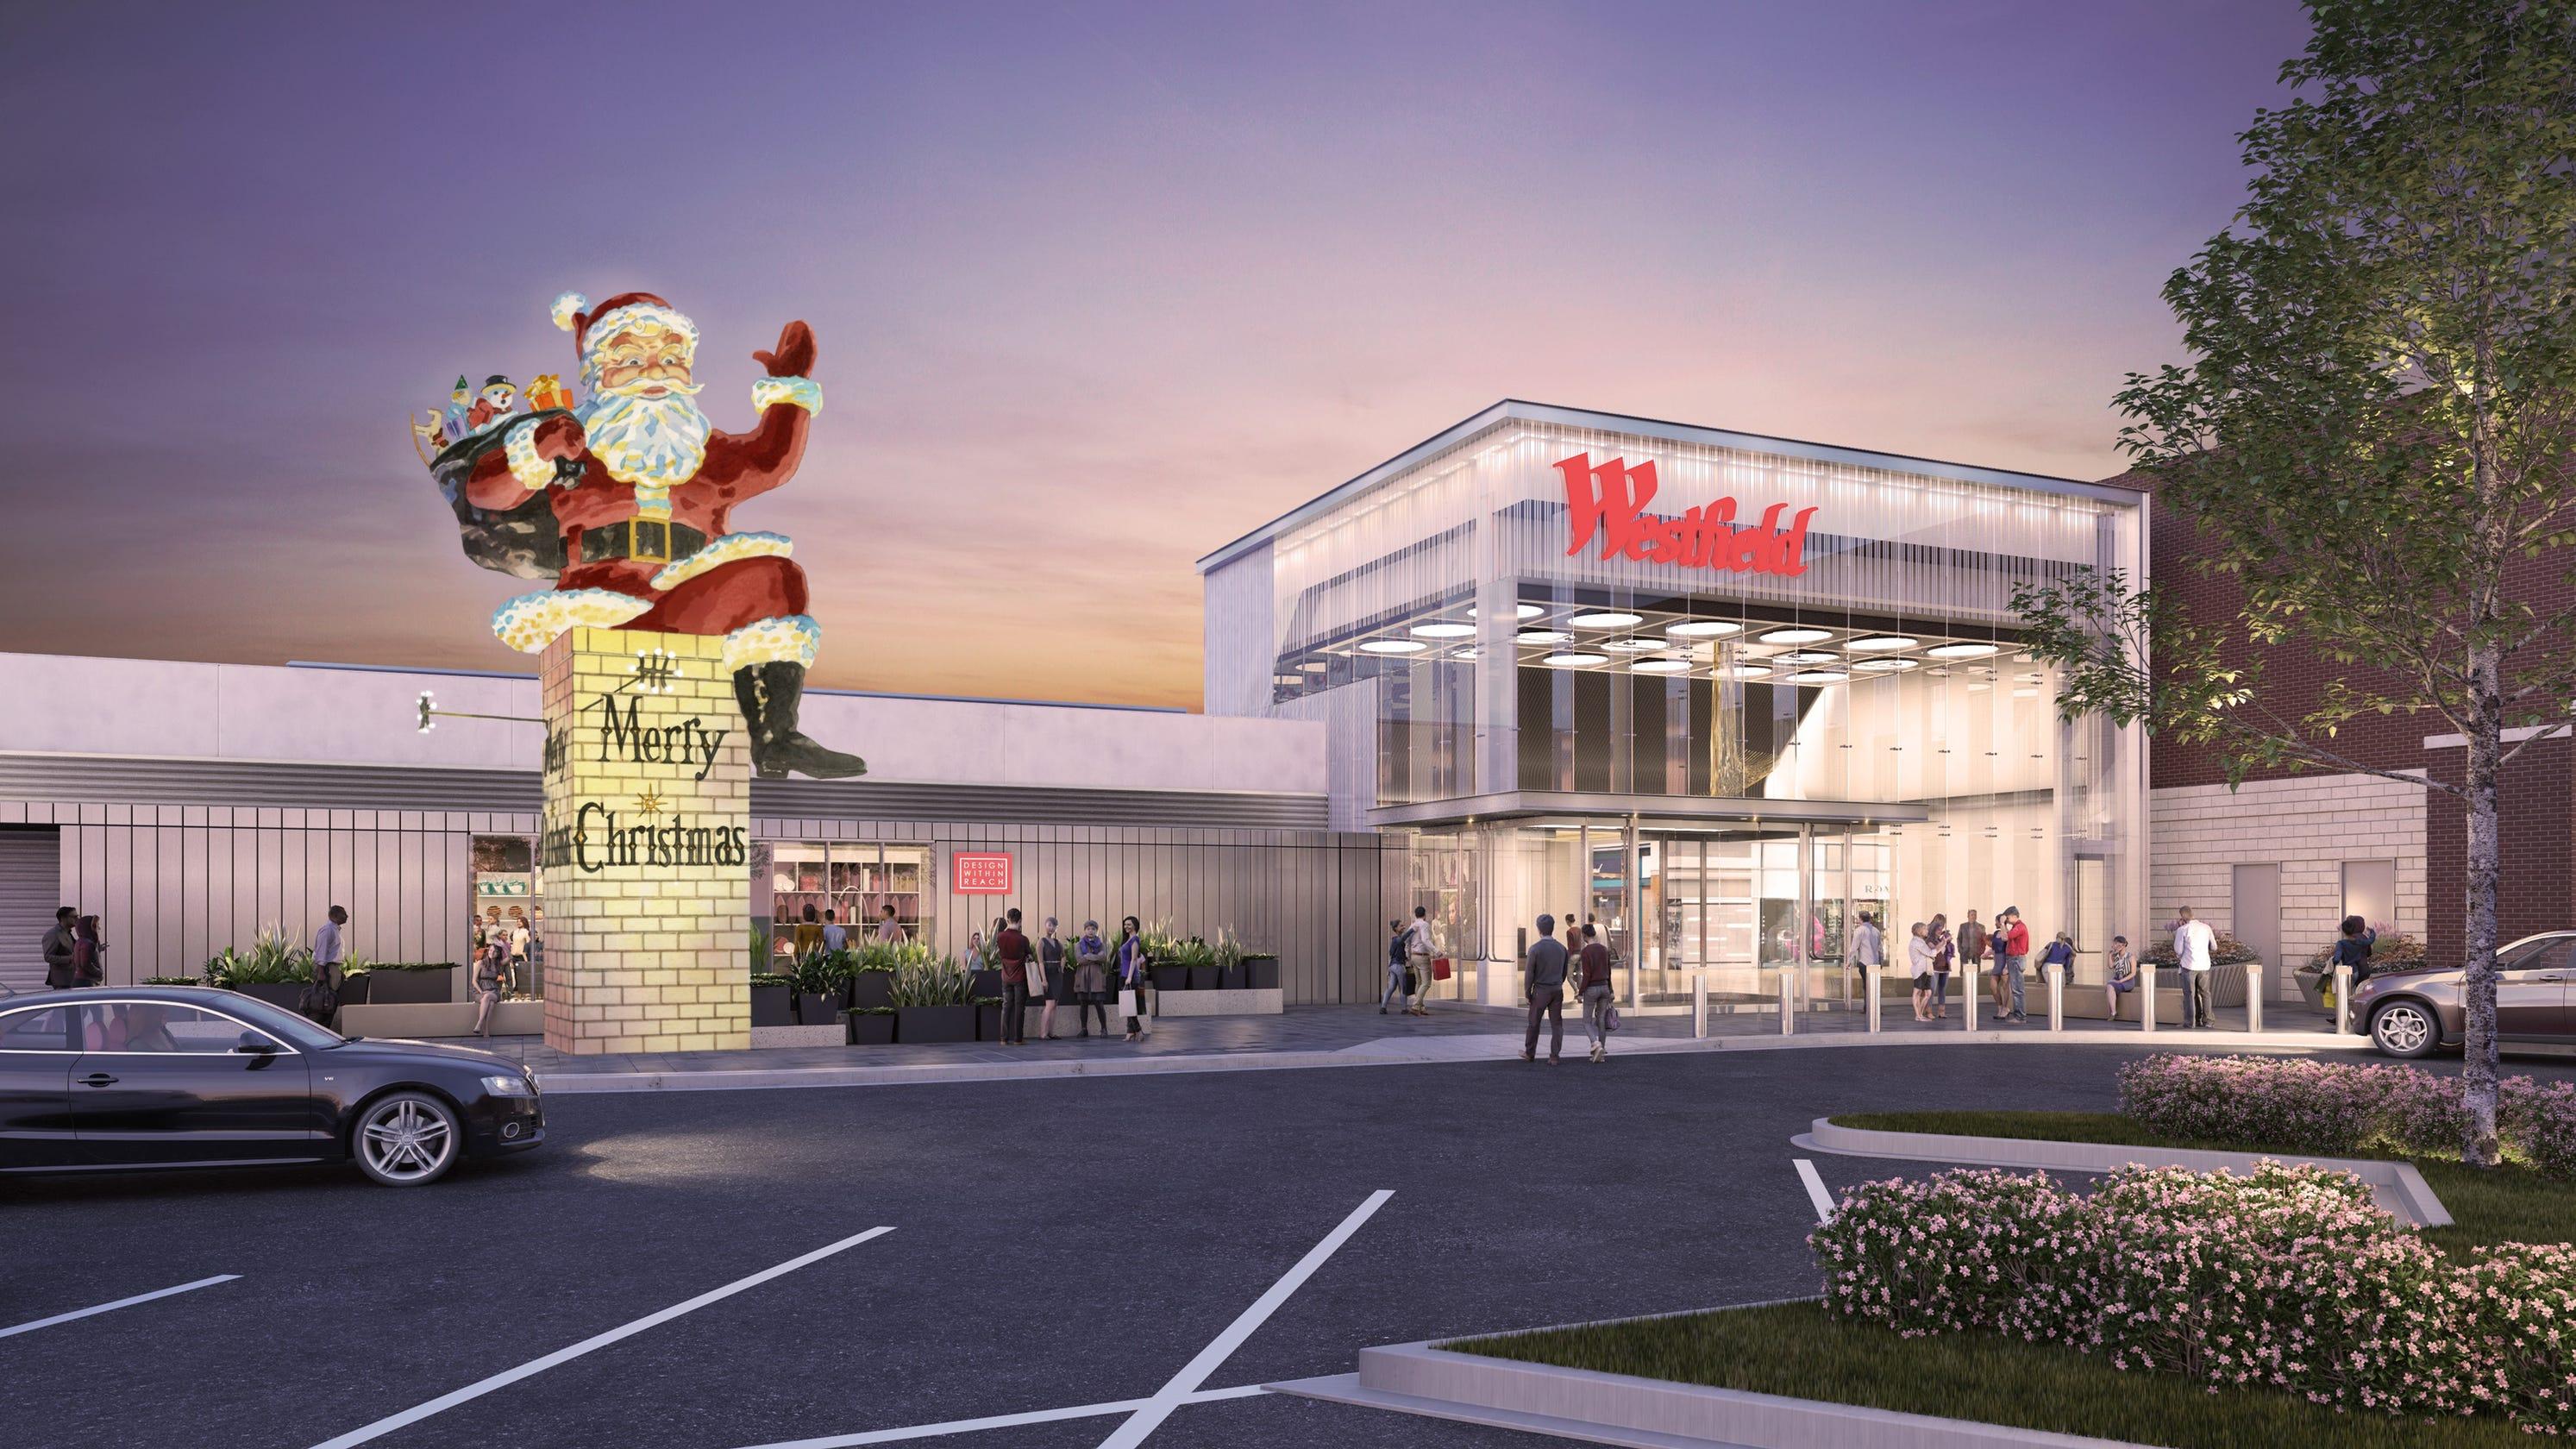 Big santa making nostalgic return to garden state plaza in paramus nj for Is garden state plaza open today